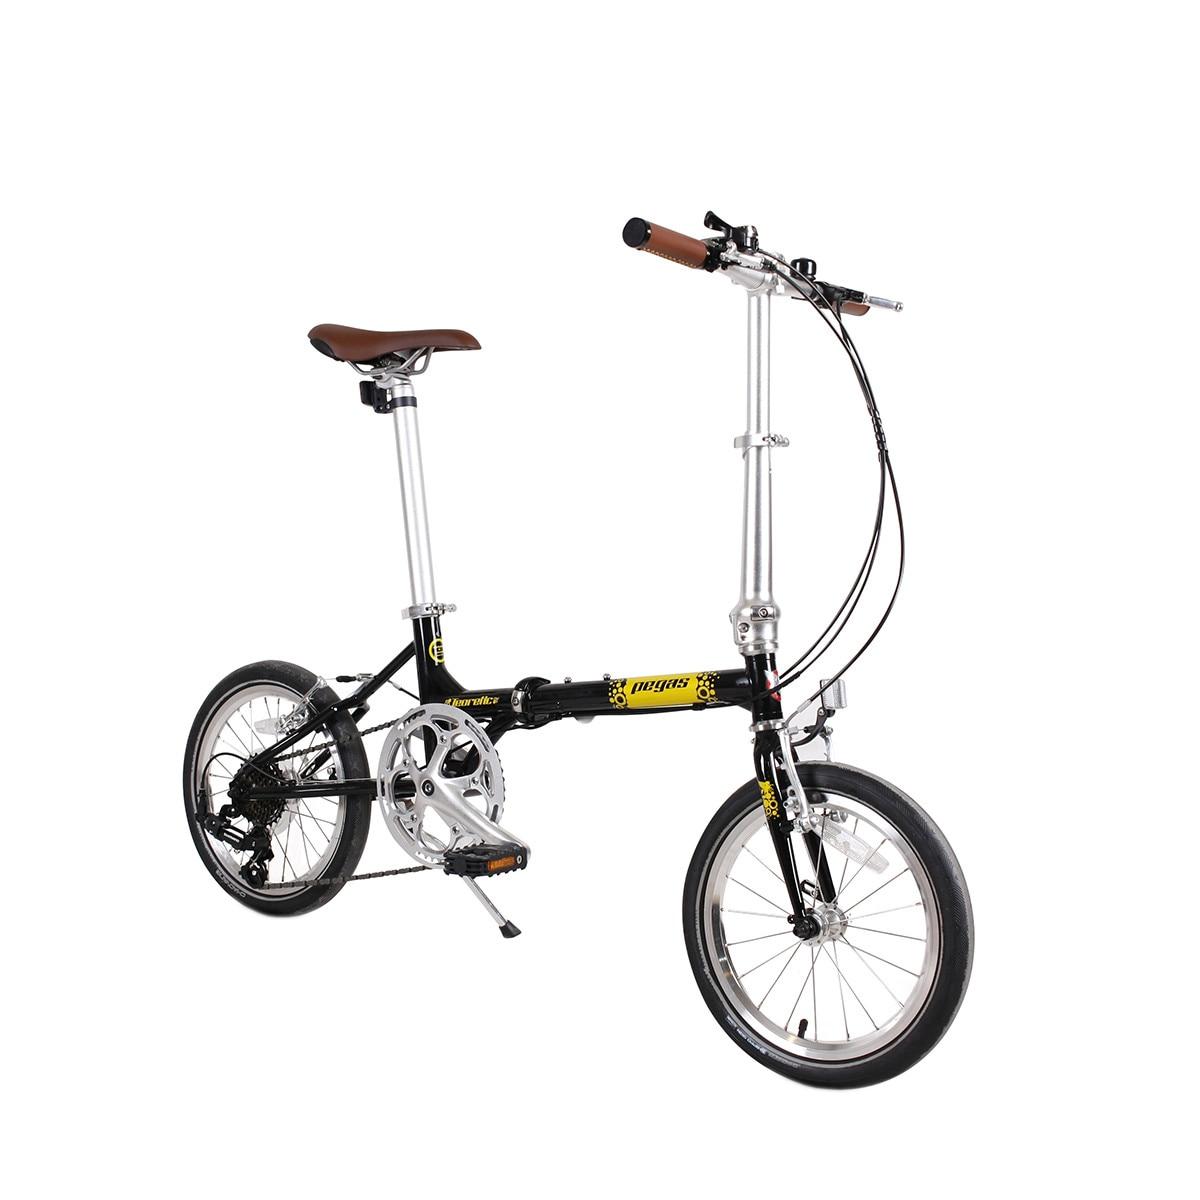 Fotografie Bicicleta Pegas Teoretic 7S, Pliabil, Negru stelar